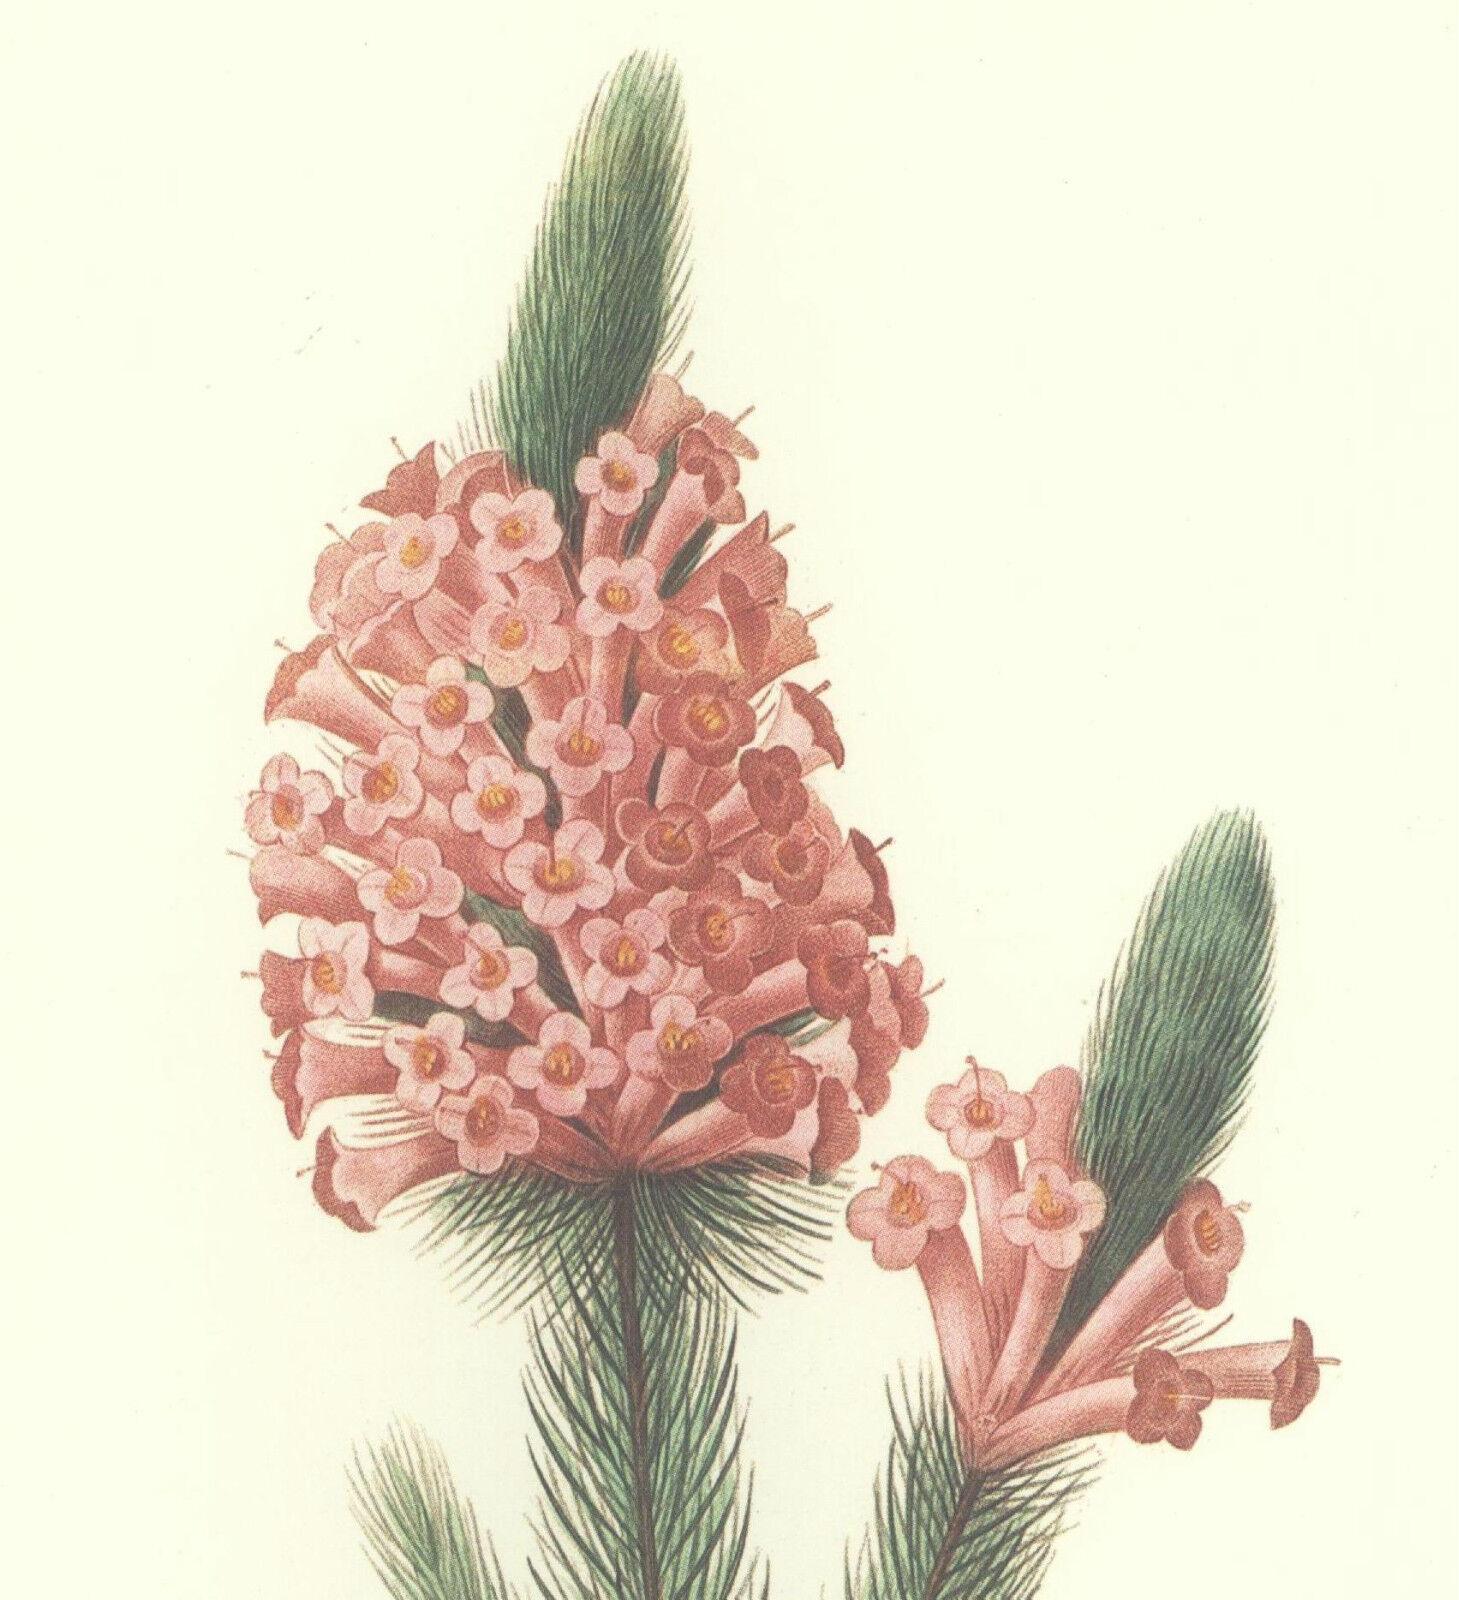 REDOUTE Botanical ERICA Flower PINK HEATHER Art #37